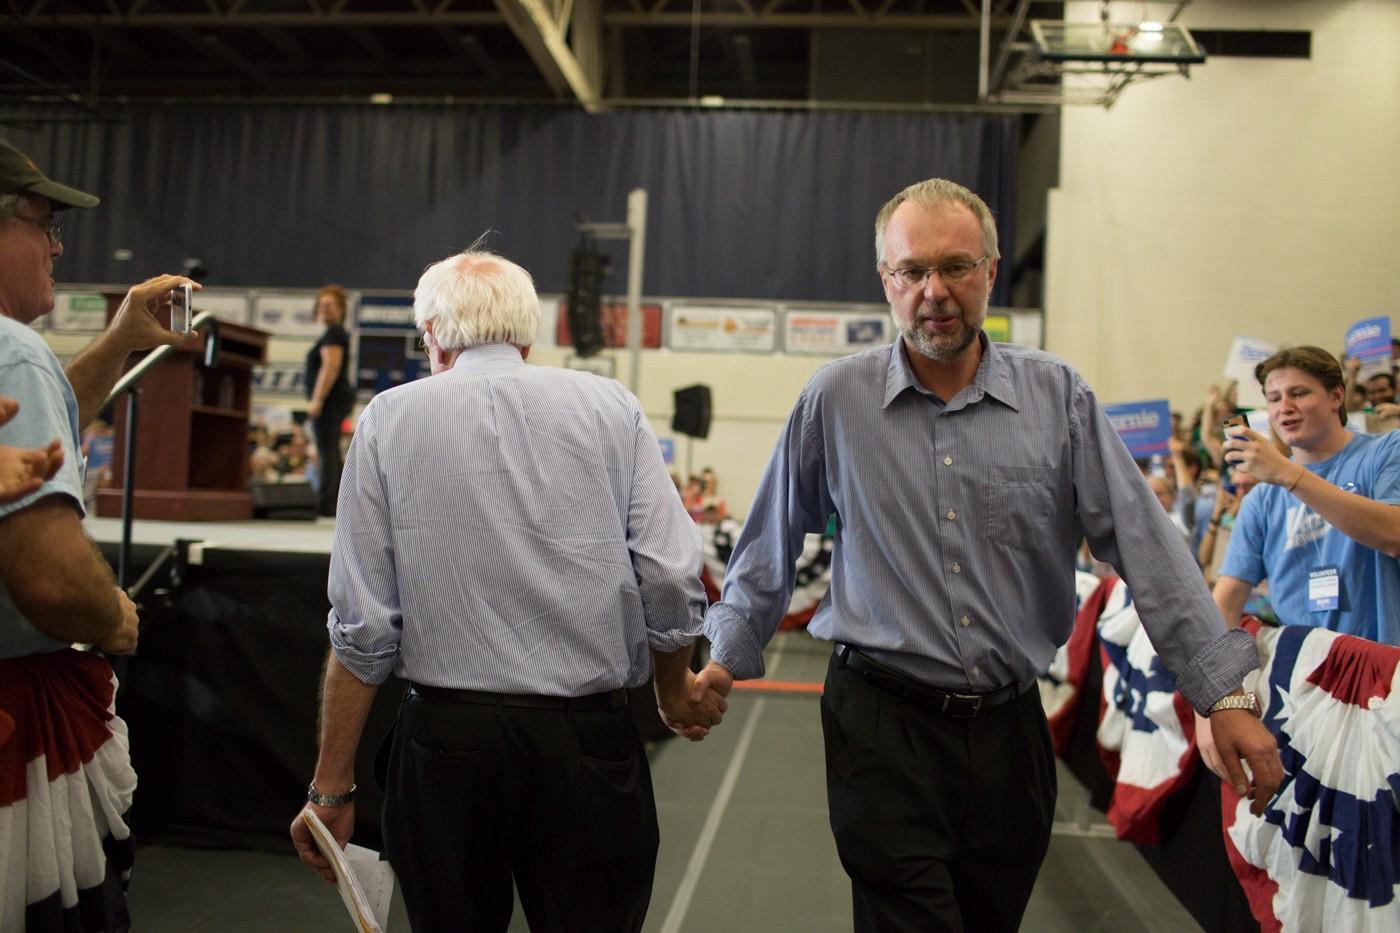 Levi Sanders: Bernie Sanders' son carries his father's